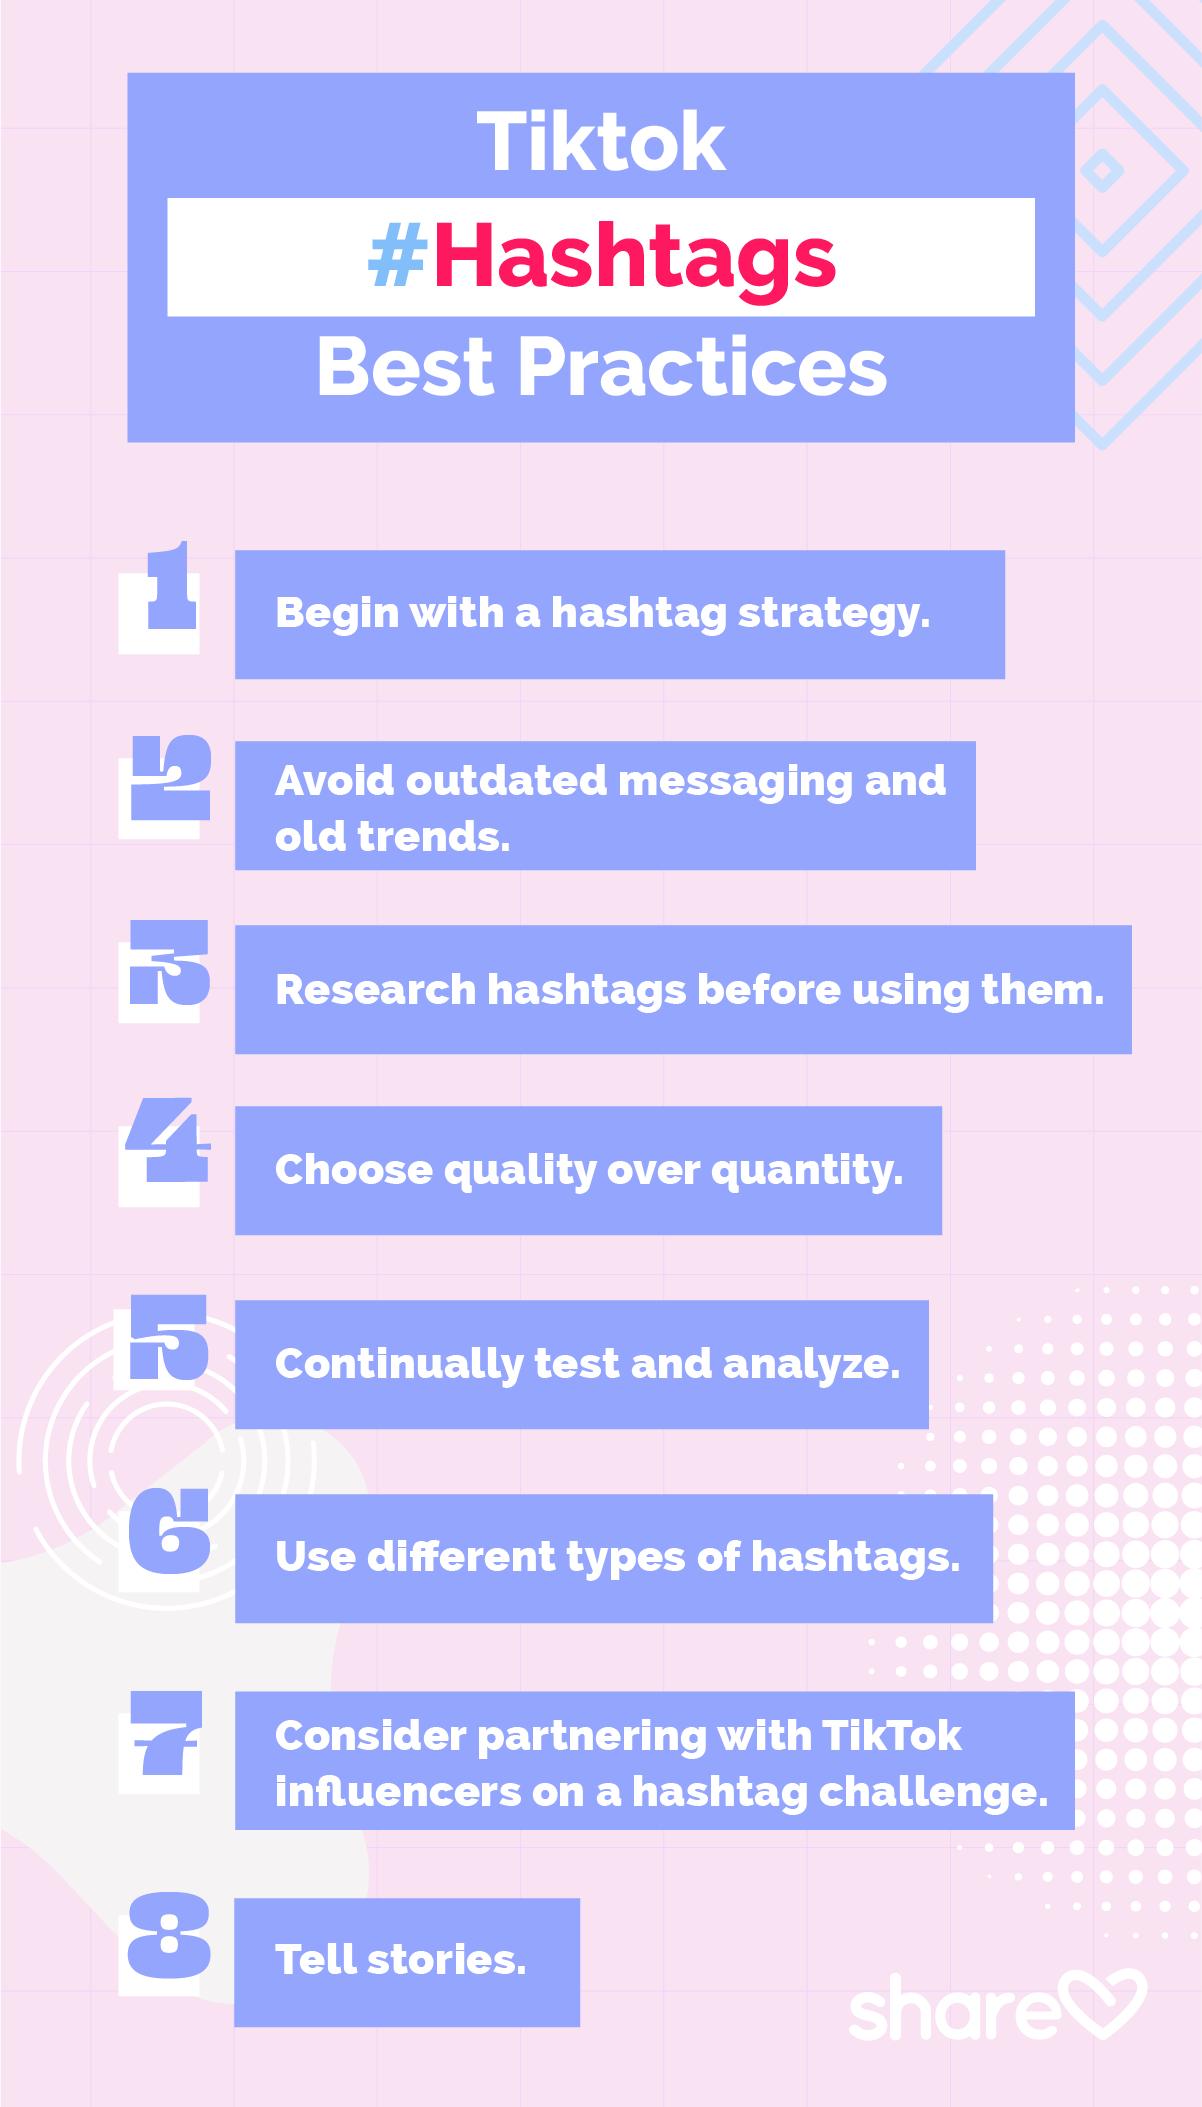 Tiktok Hashtags Best Practices